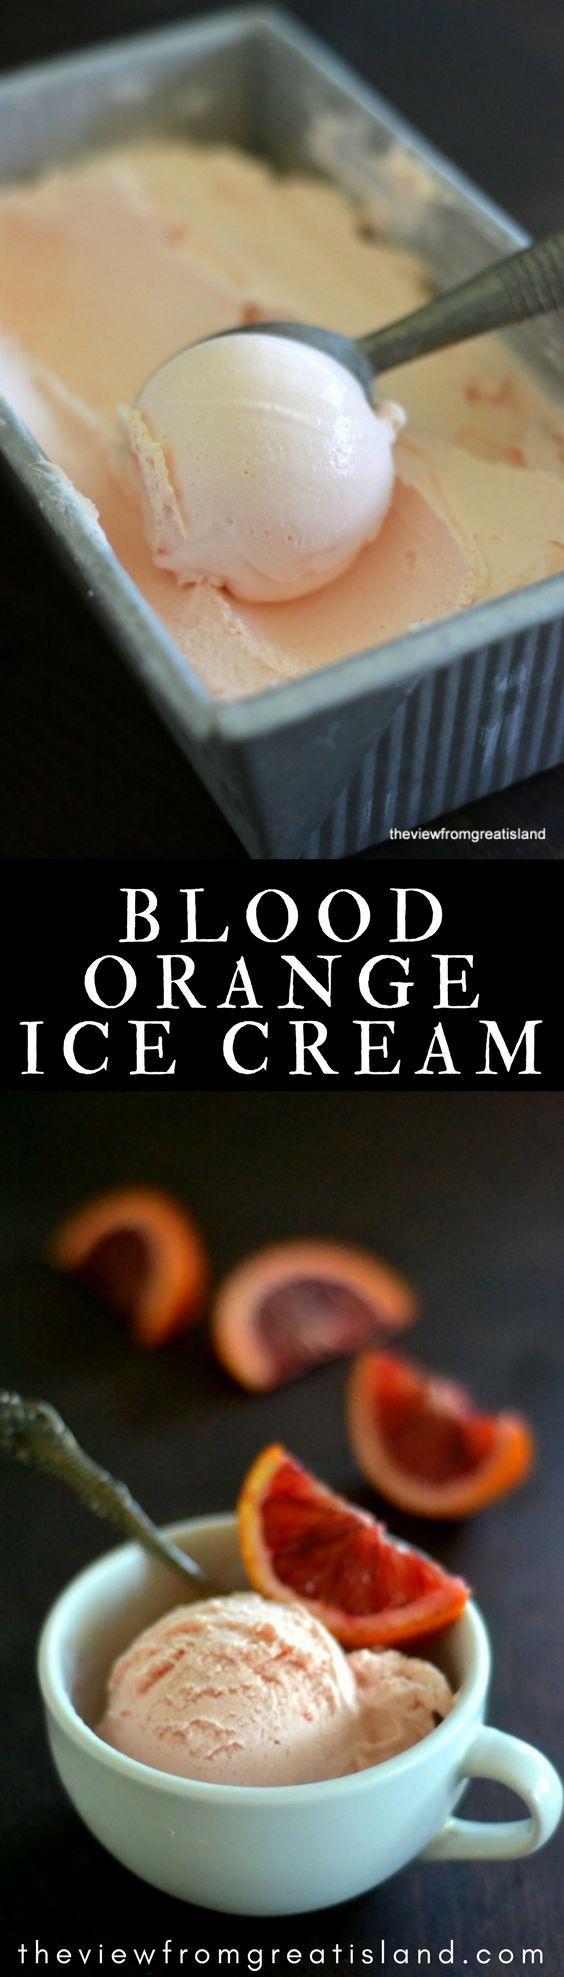 Blood Orange Ice Cream